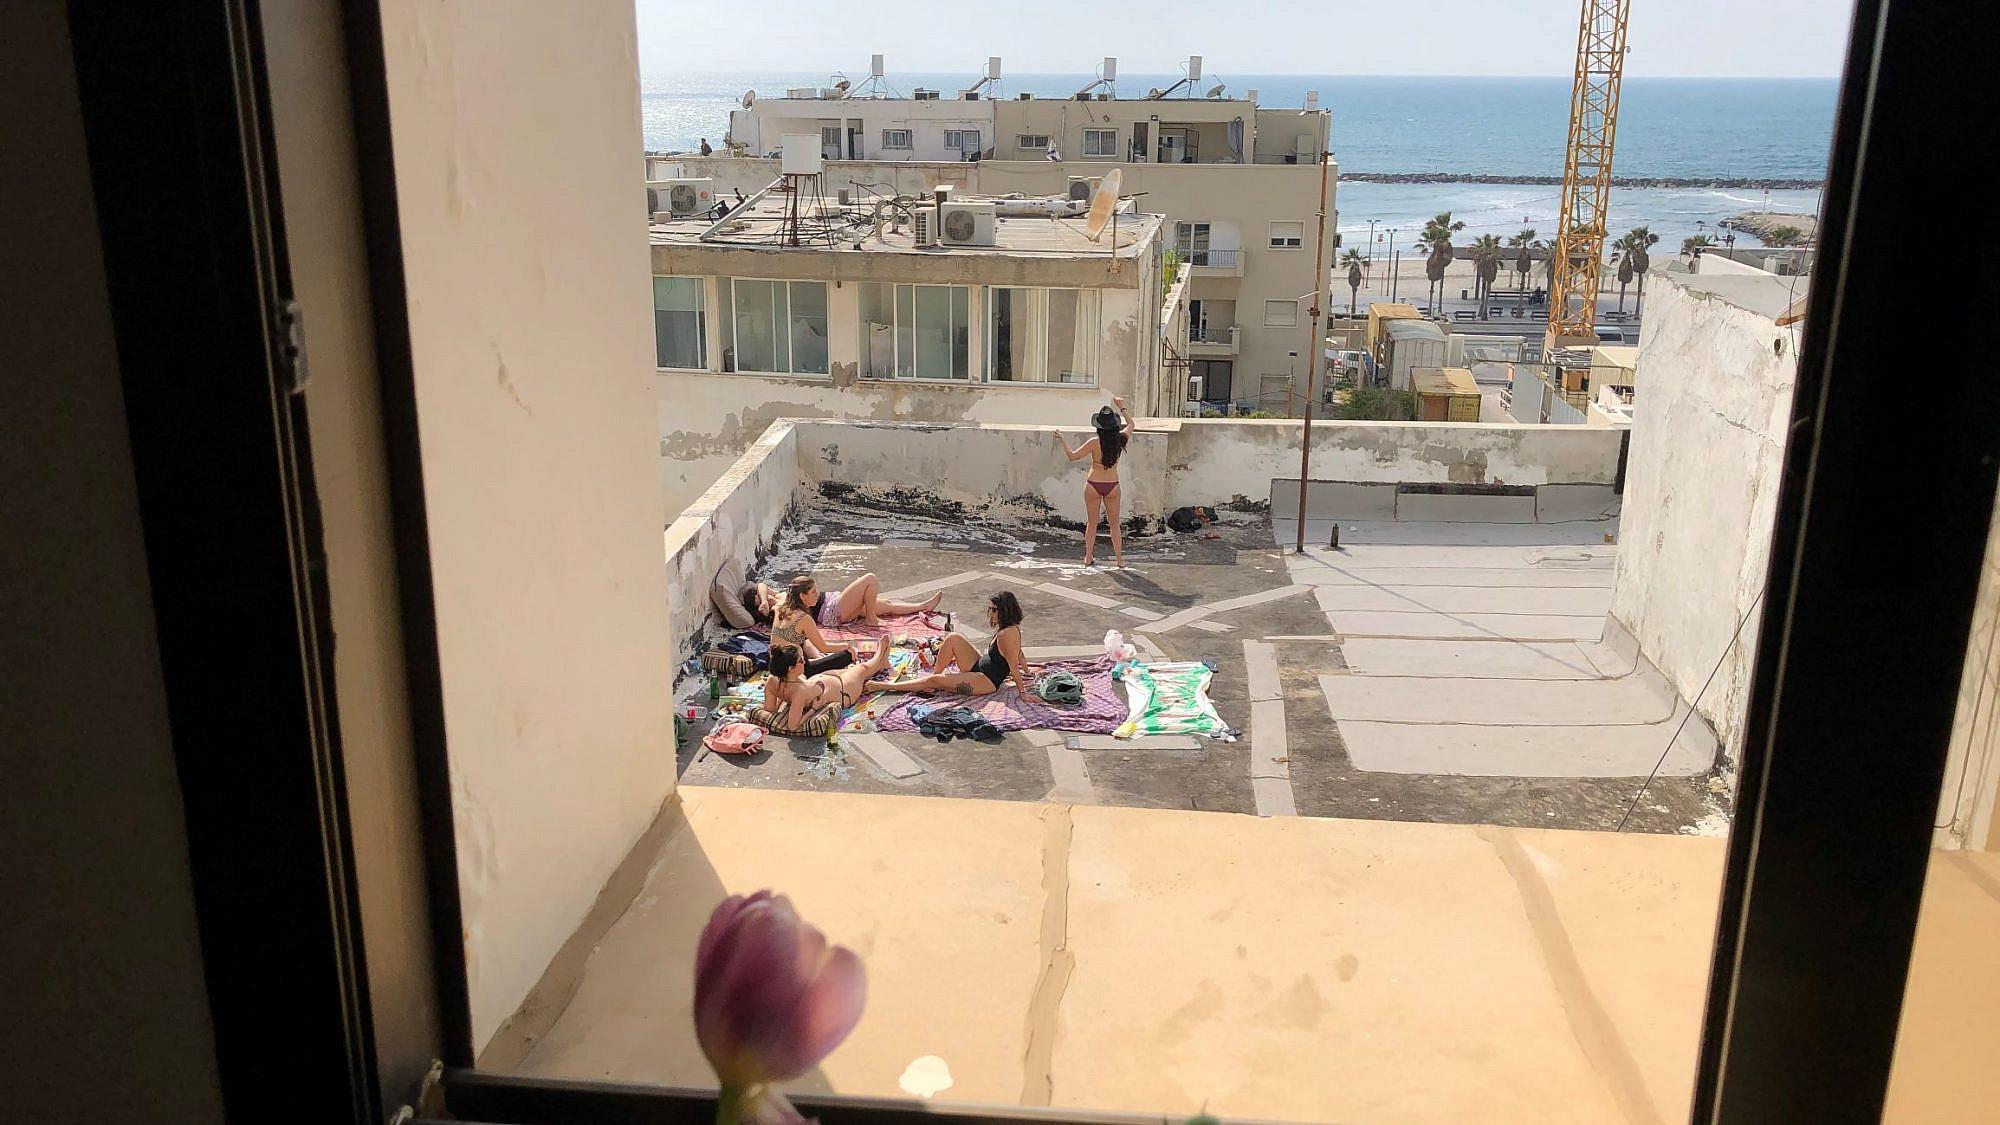 peeping flower. צילום: יעלי לוי טל, תל אביב